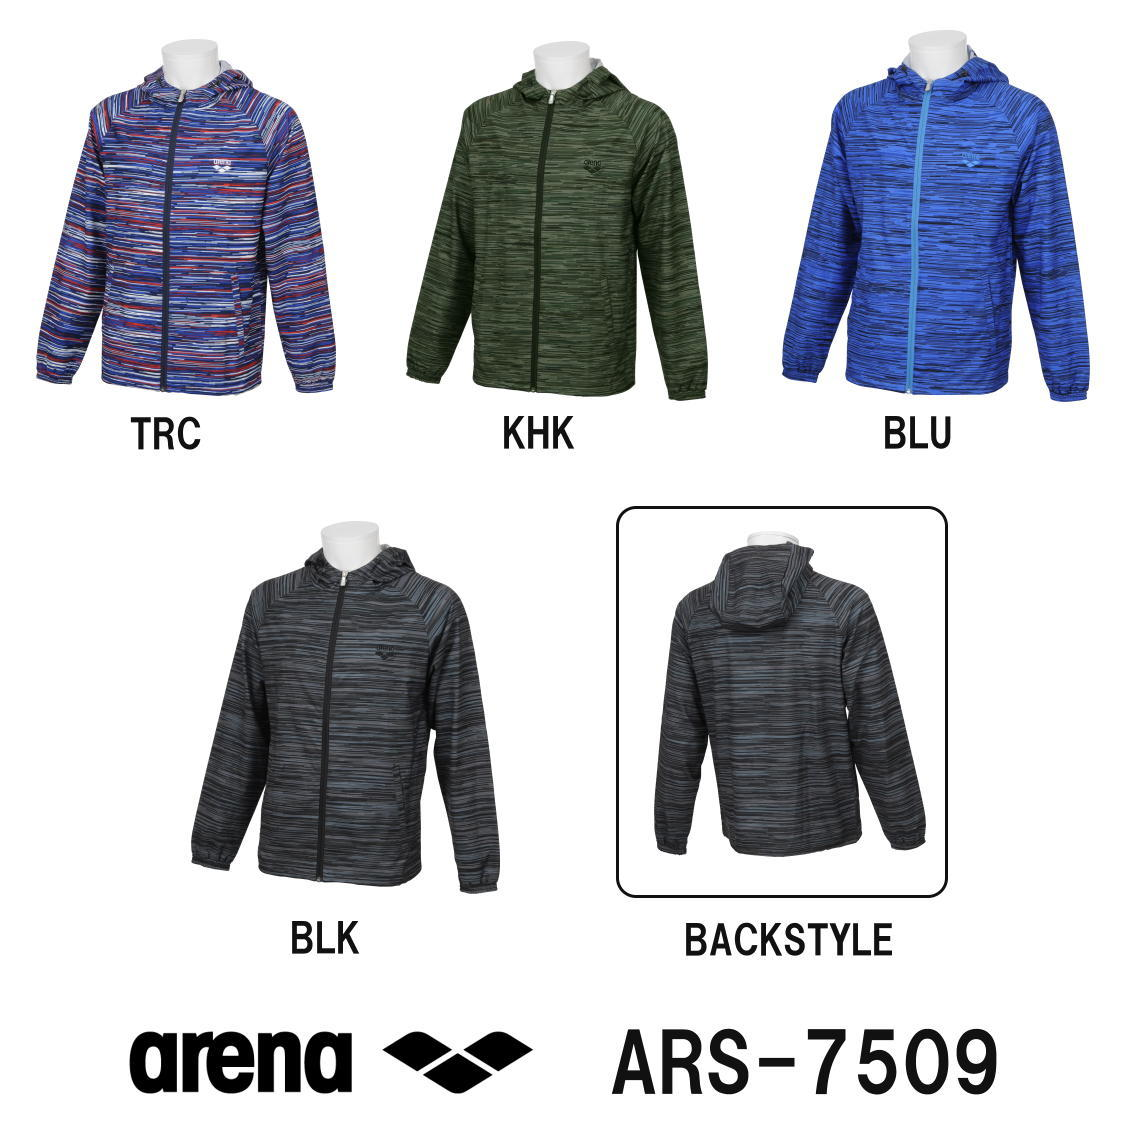 ●●【ARS-7509】ARENA(アリーナ) ストレッチクロス ウィンドジャケット[スイミング/水泳/アパレル/トレーニングウェア]